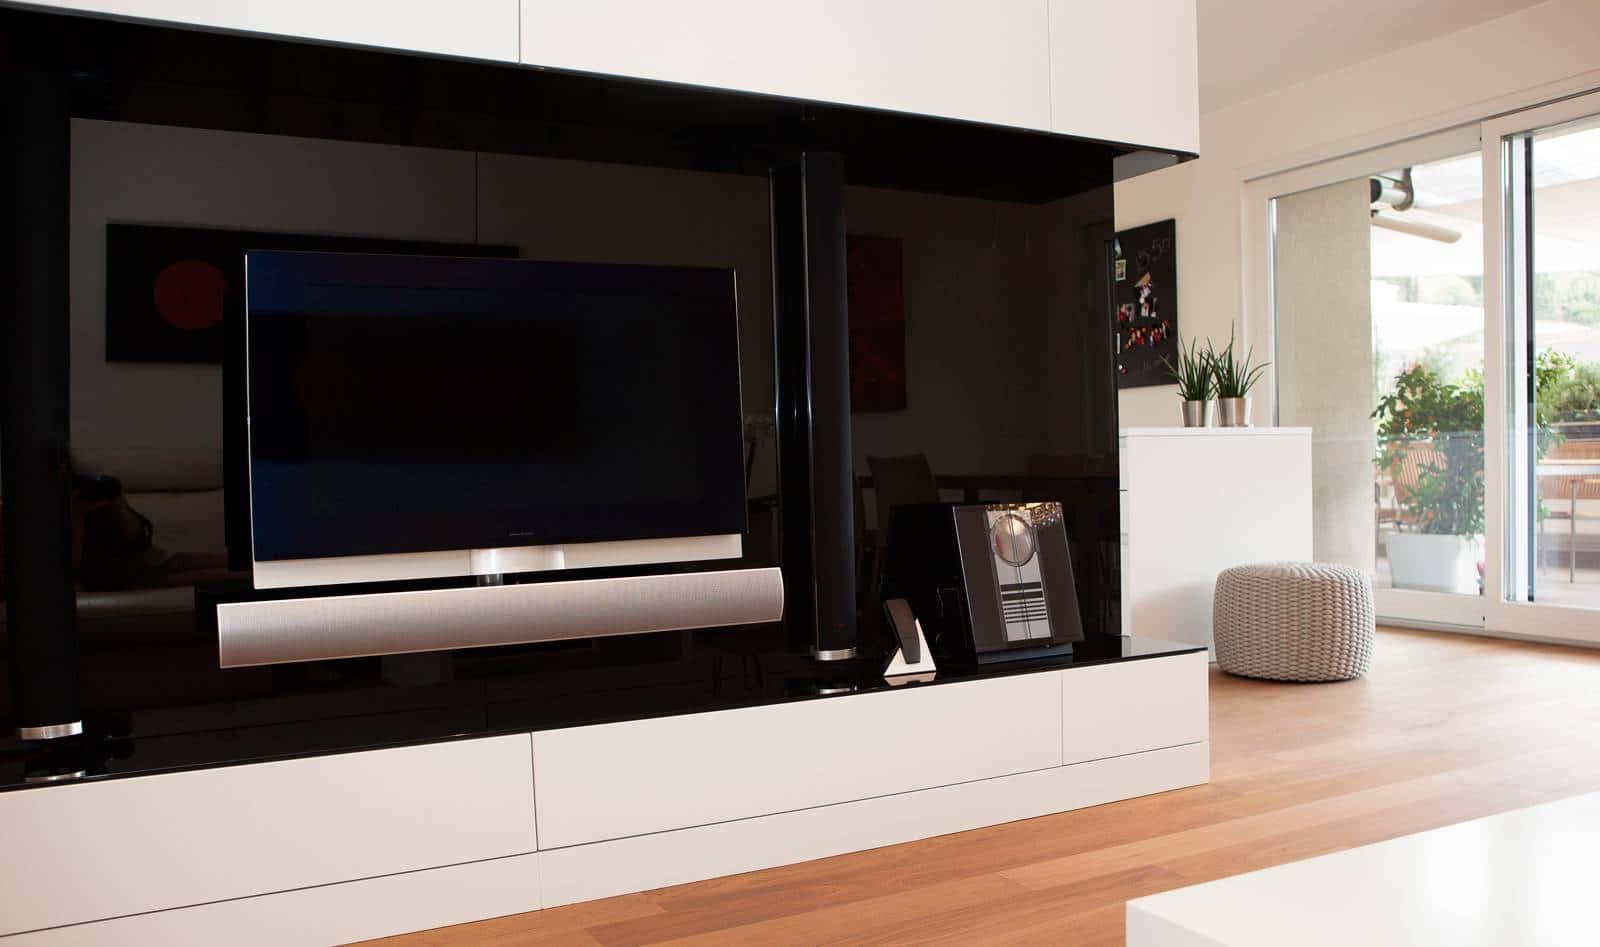 Muebles Modernos Para Great Kit De Muebles Modernos Para Casa  # Muebles Sobre Diseo